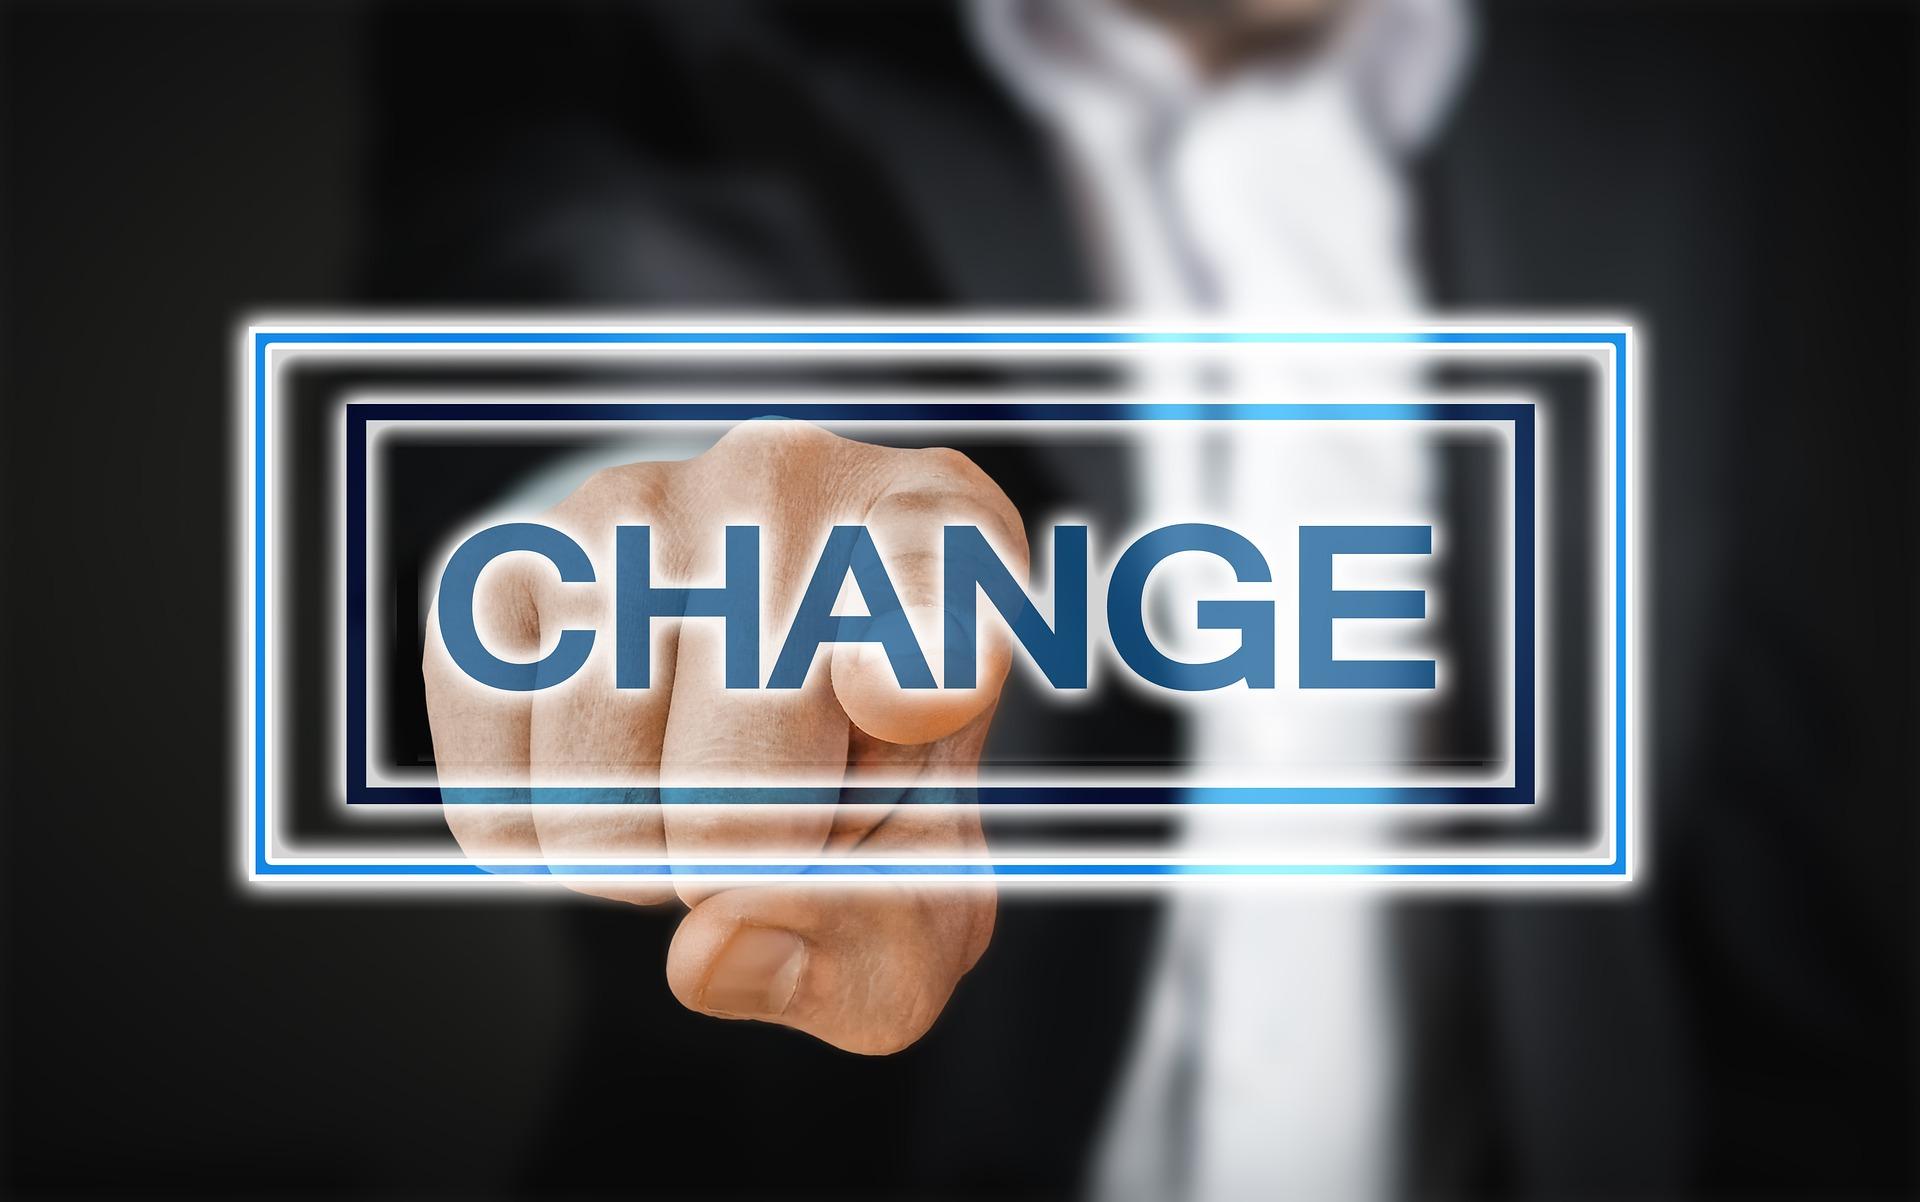 change-2933032_1920.jpg